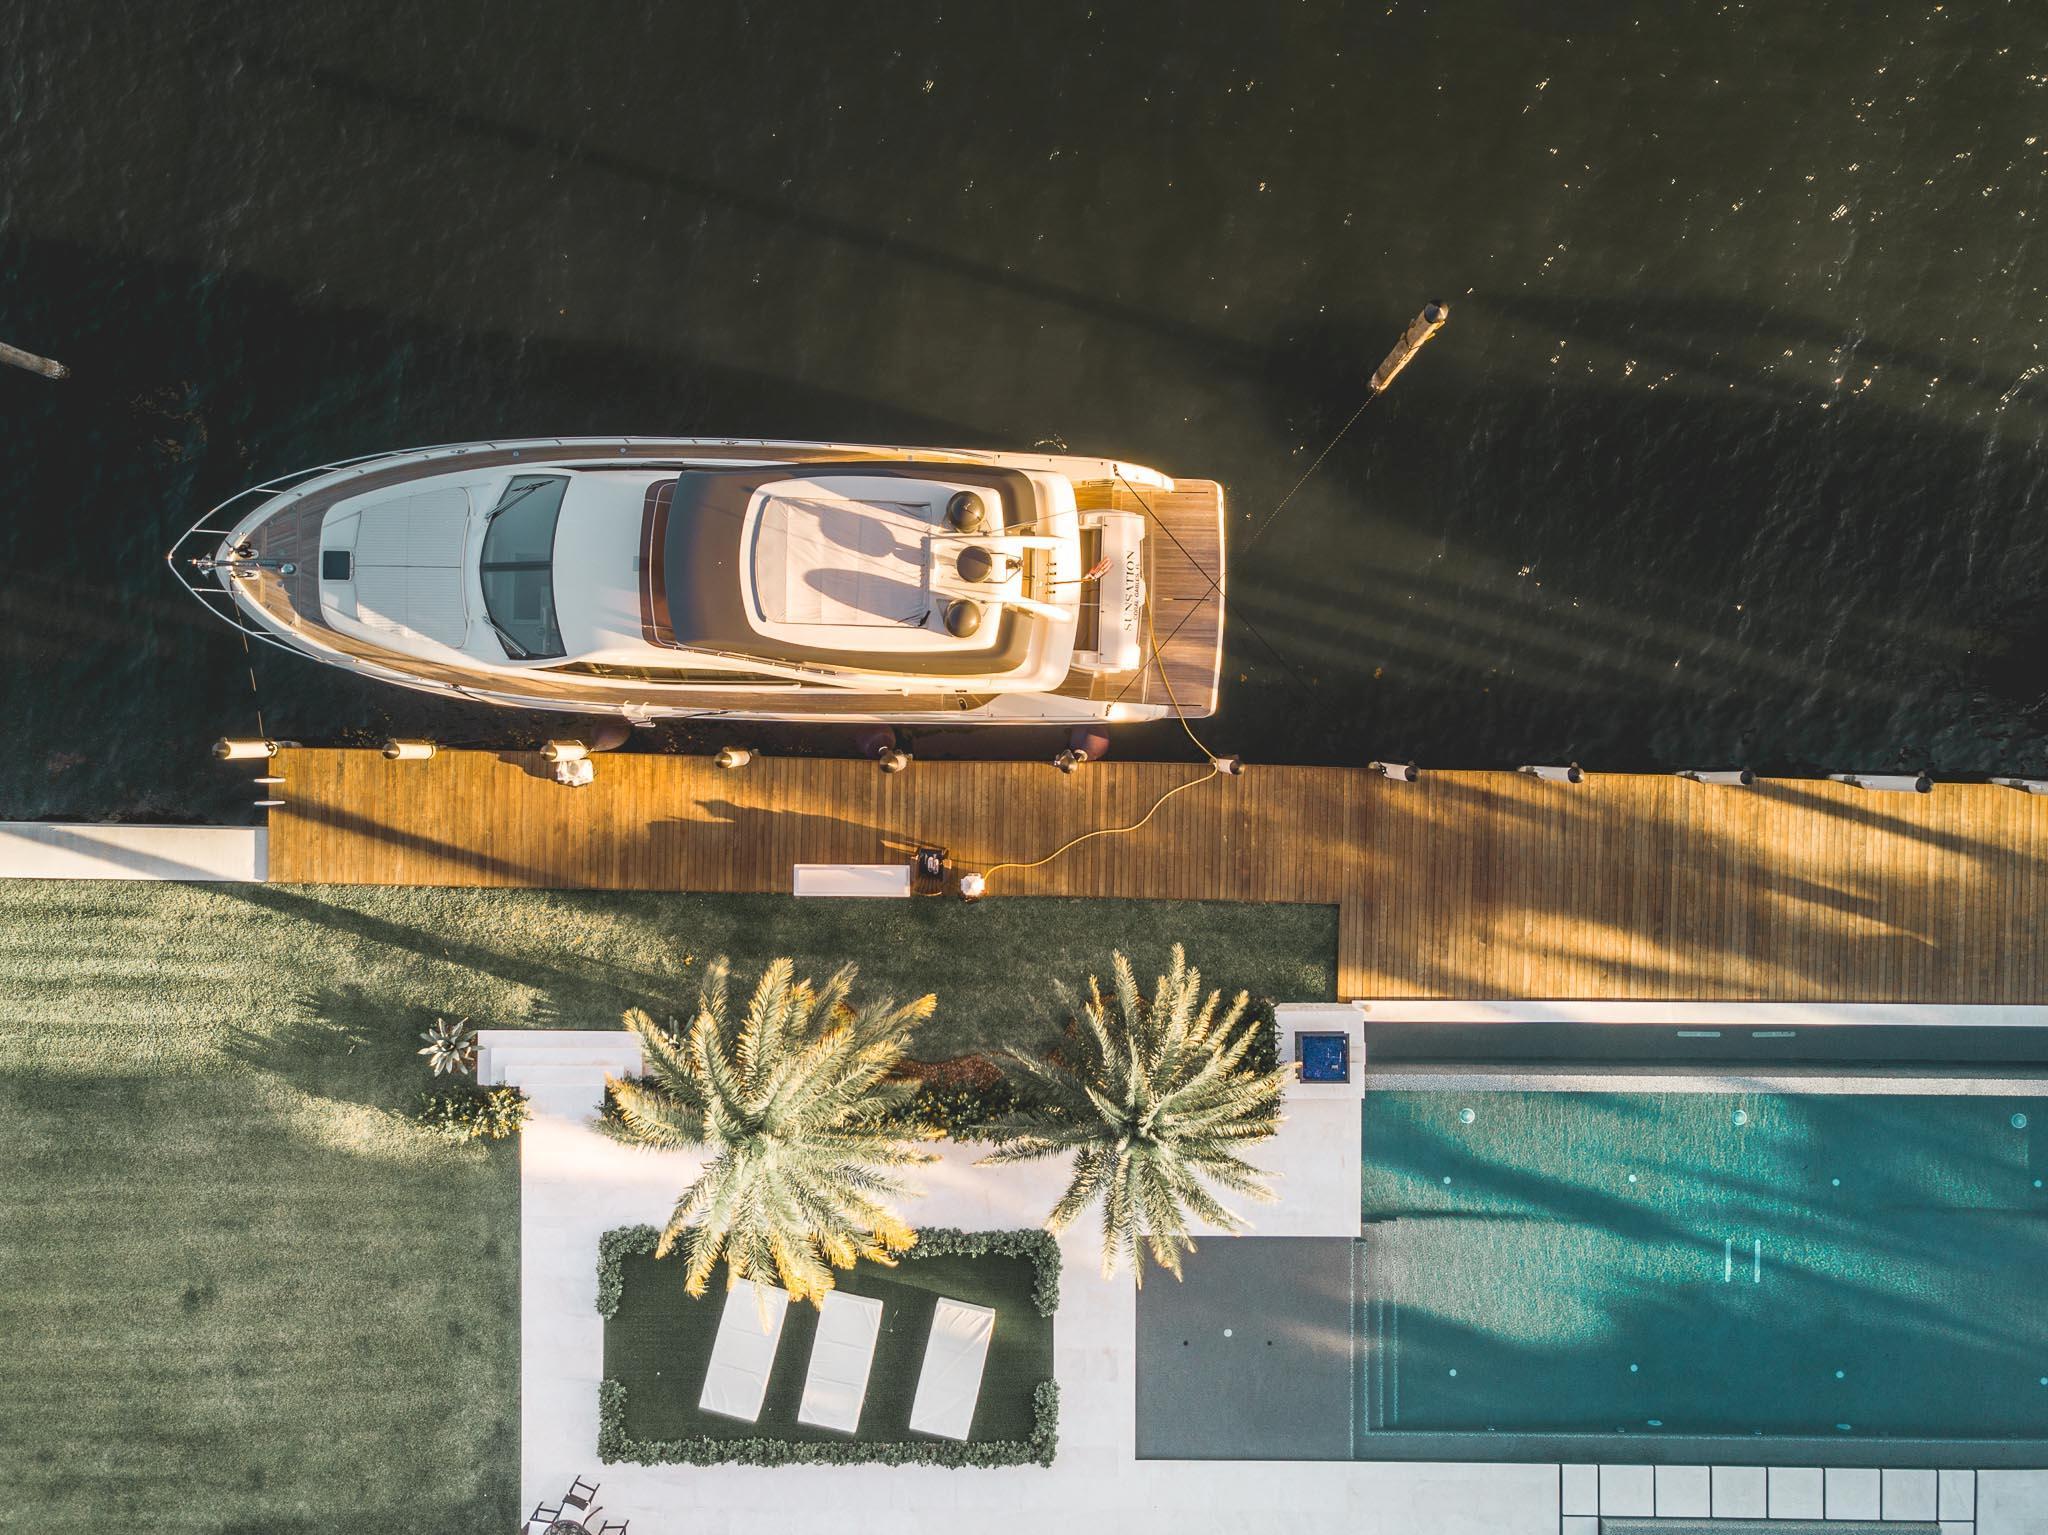 2016 Ferretti 650 - Ariel View